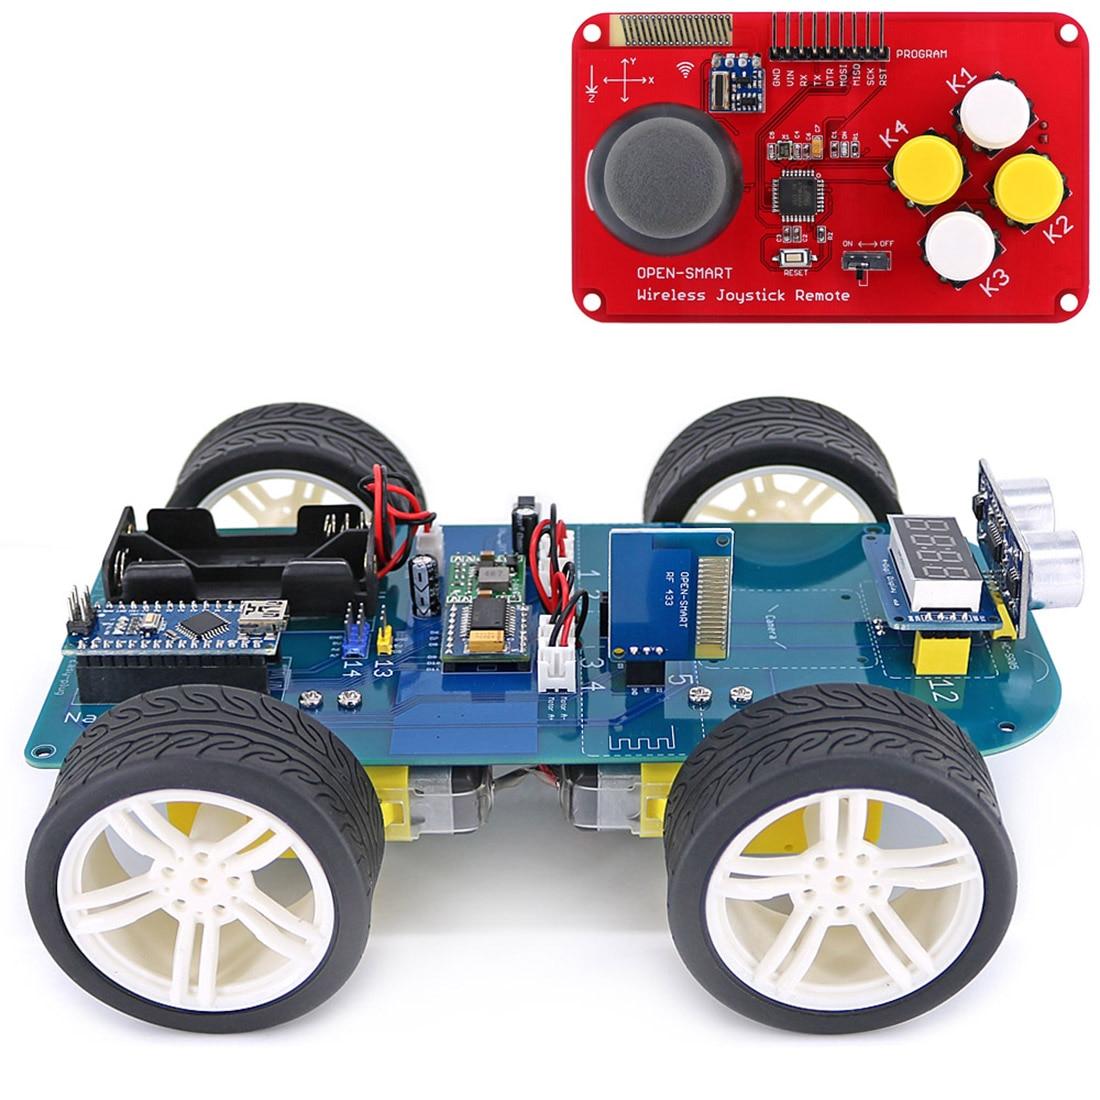 4WD 433MHz Wireless JoyStick Remote Control Rubber Wheel Gear Motor DIY Smart Car Kit For Arduino High-tech Programmable Toy